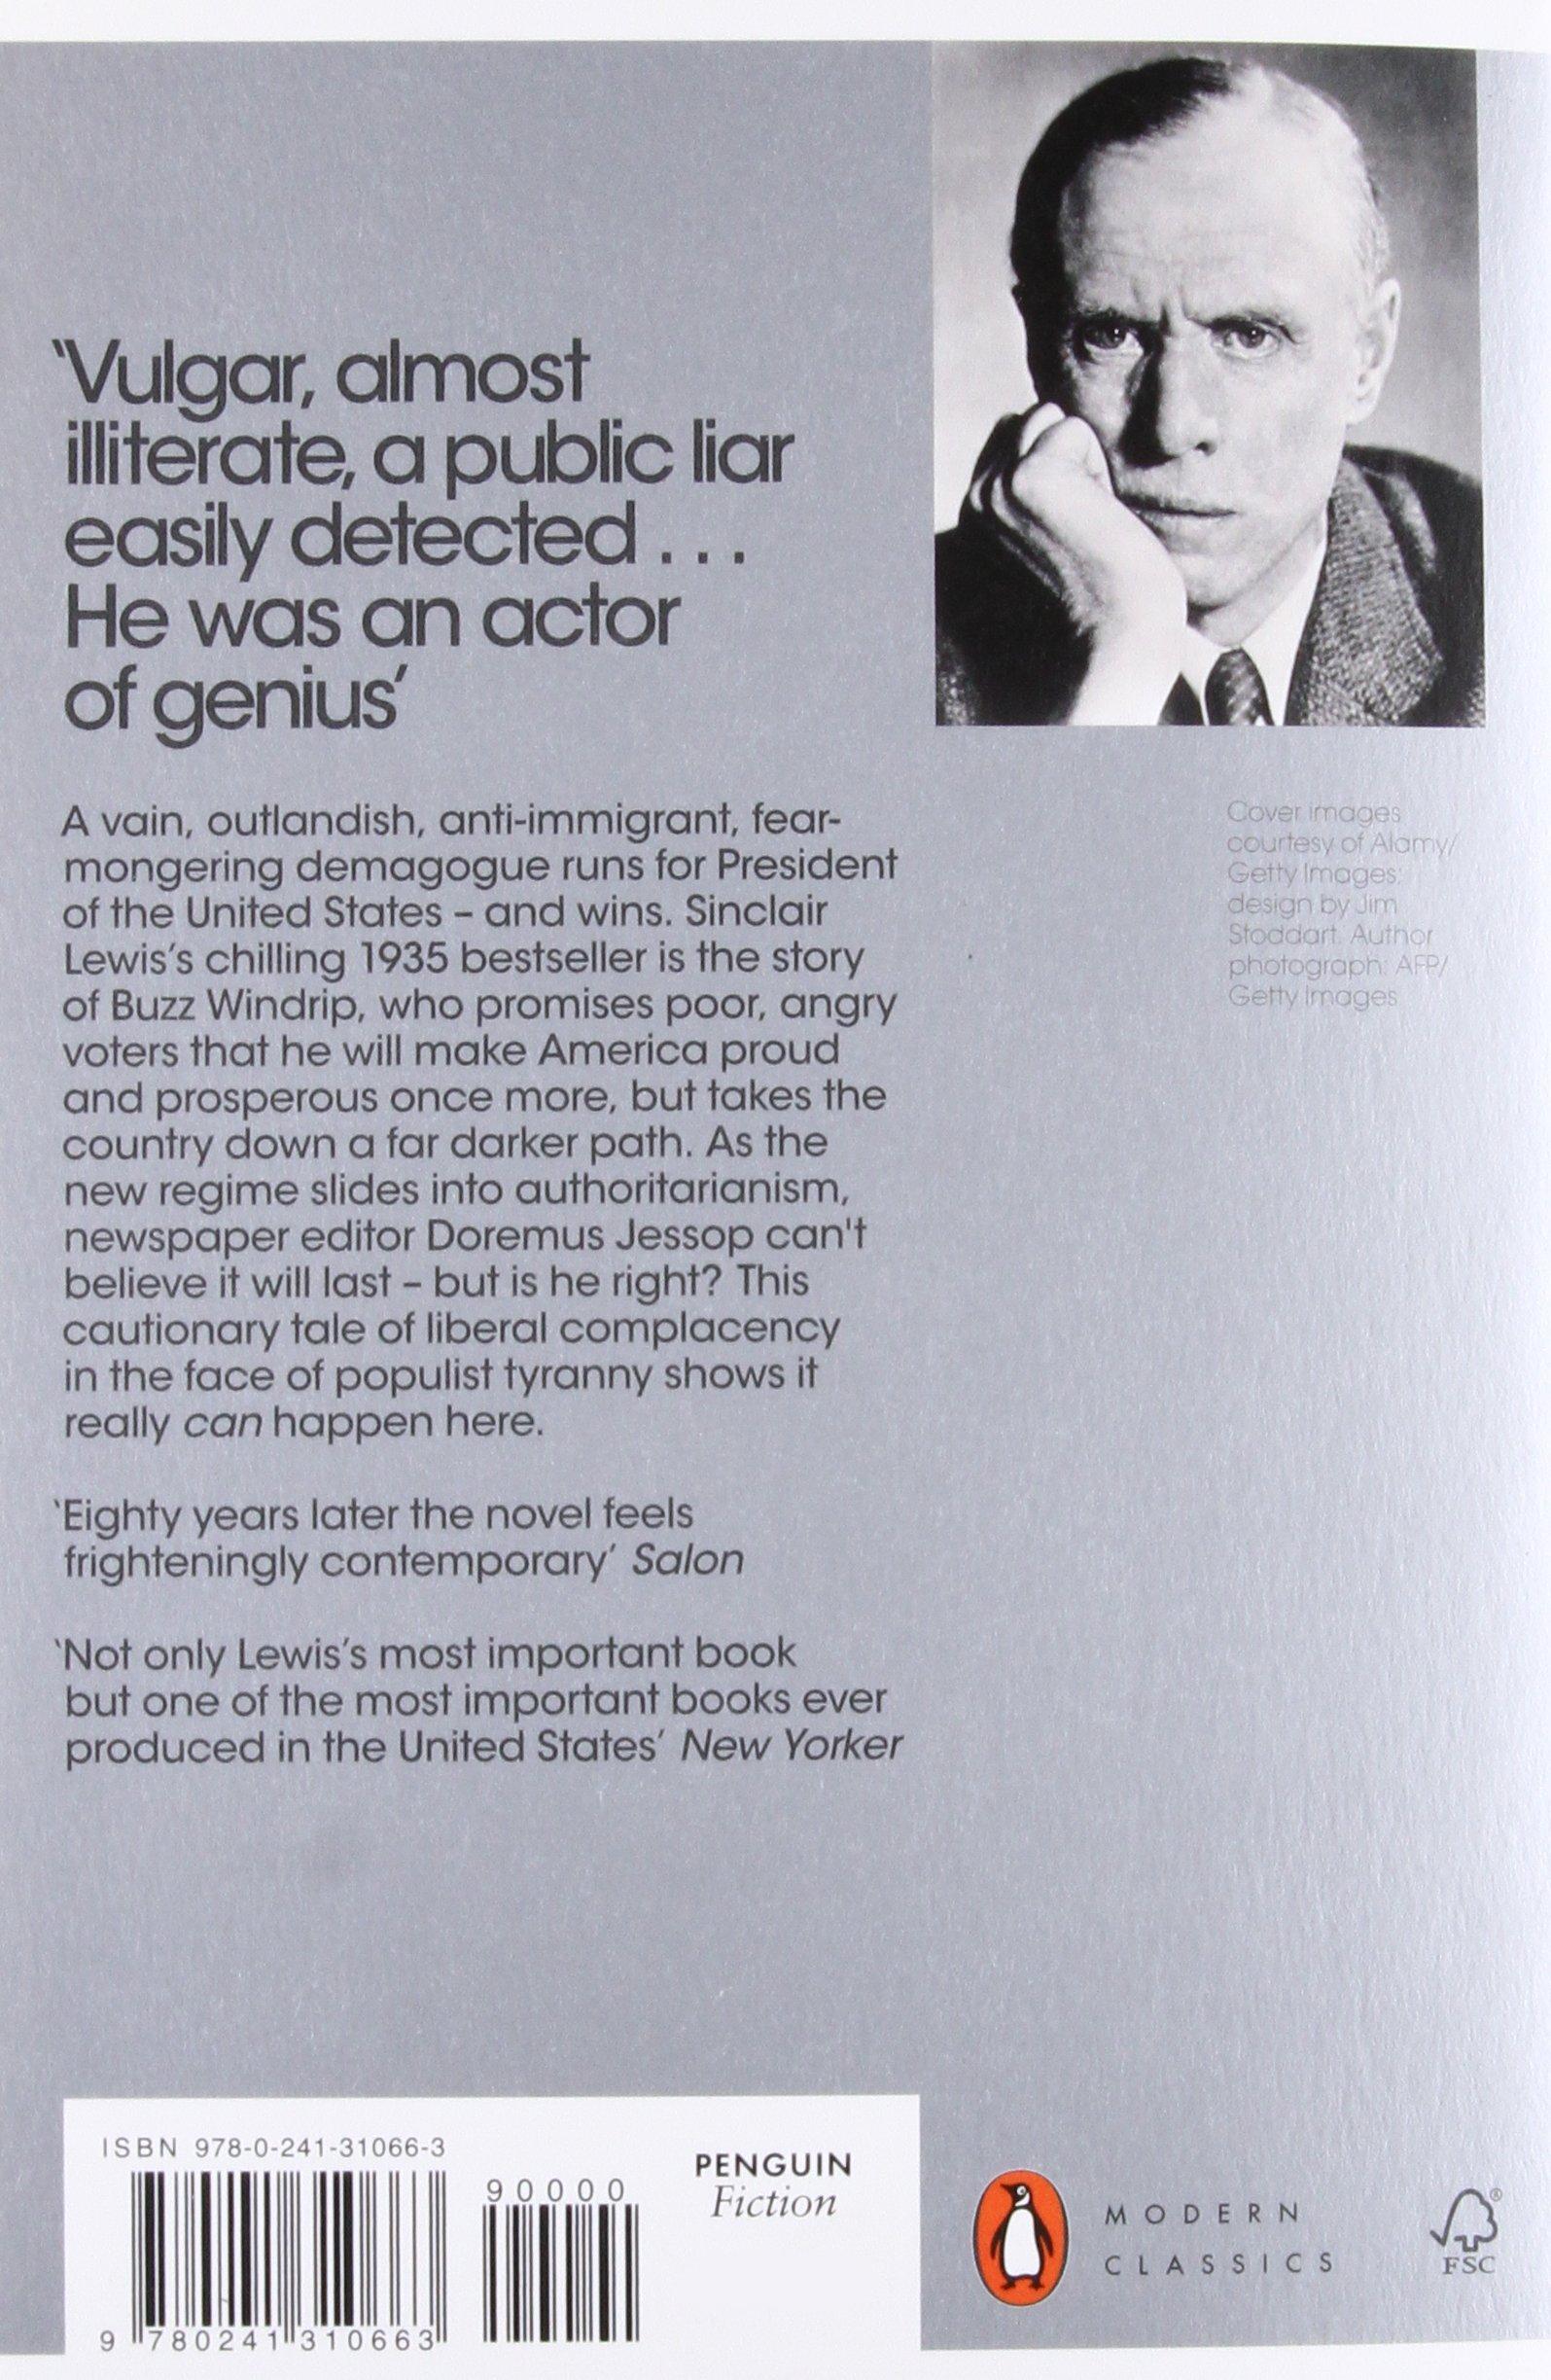 It Can't Happen Here (Penguin Modern Classics): Amazon.co.uk: Sinclair  Lewis: 9780241310663: Books